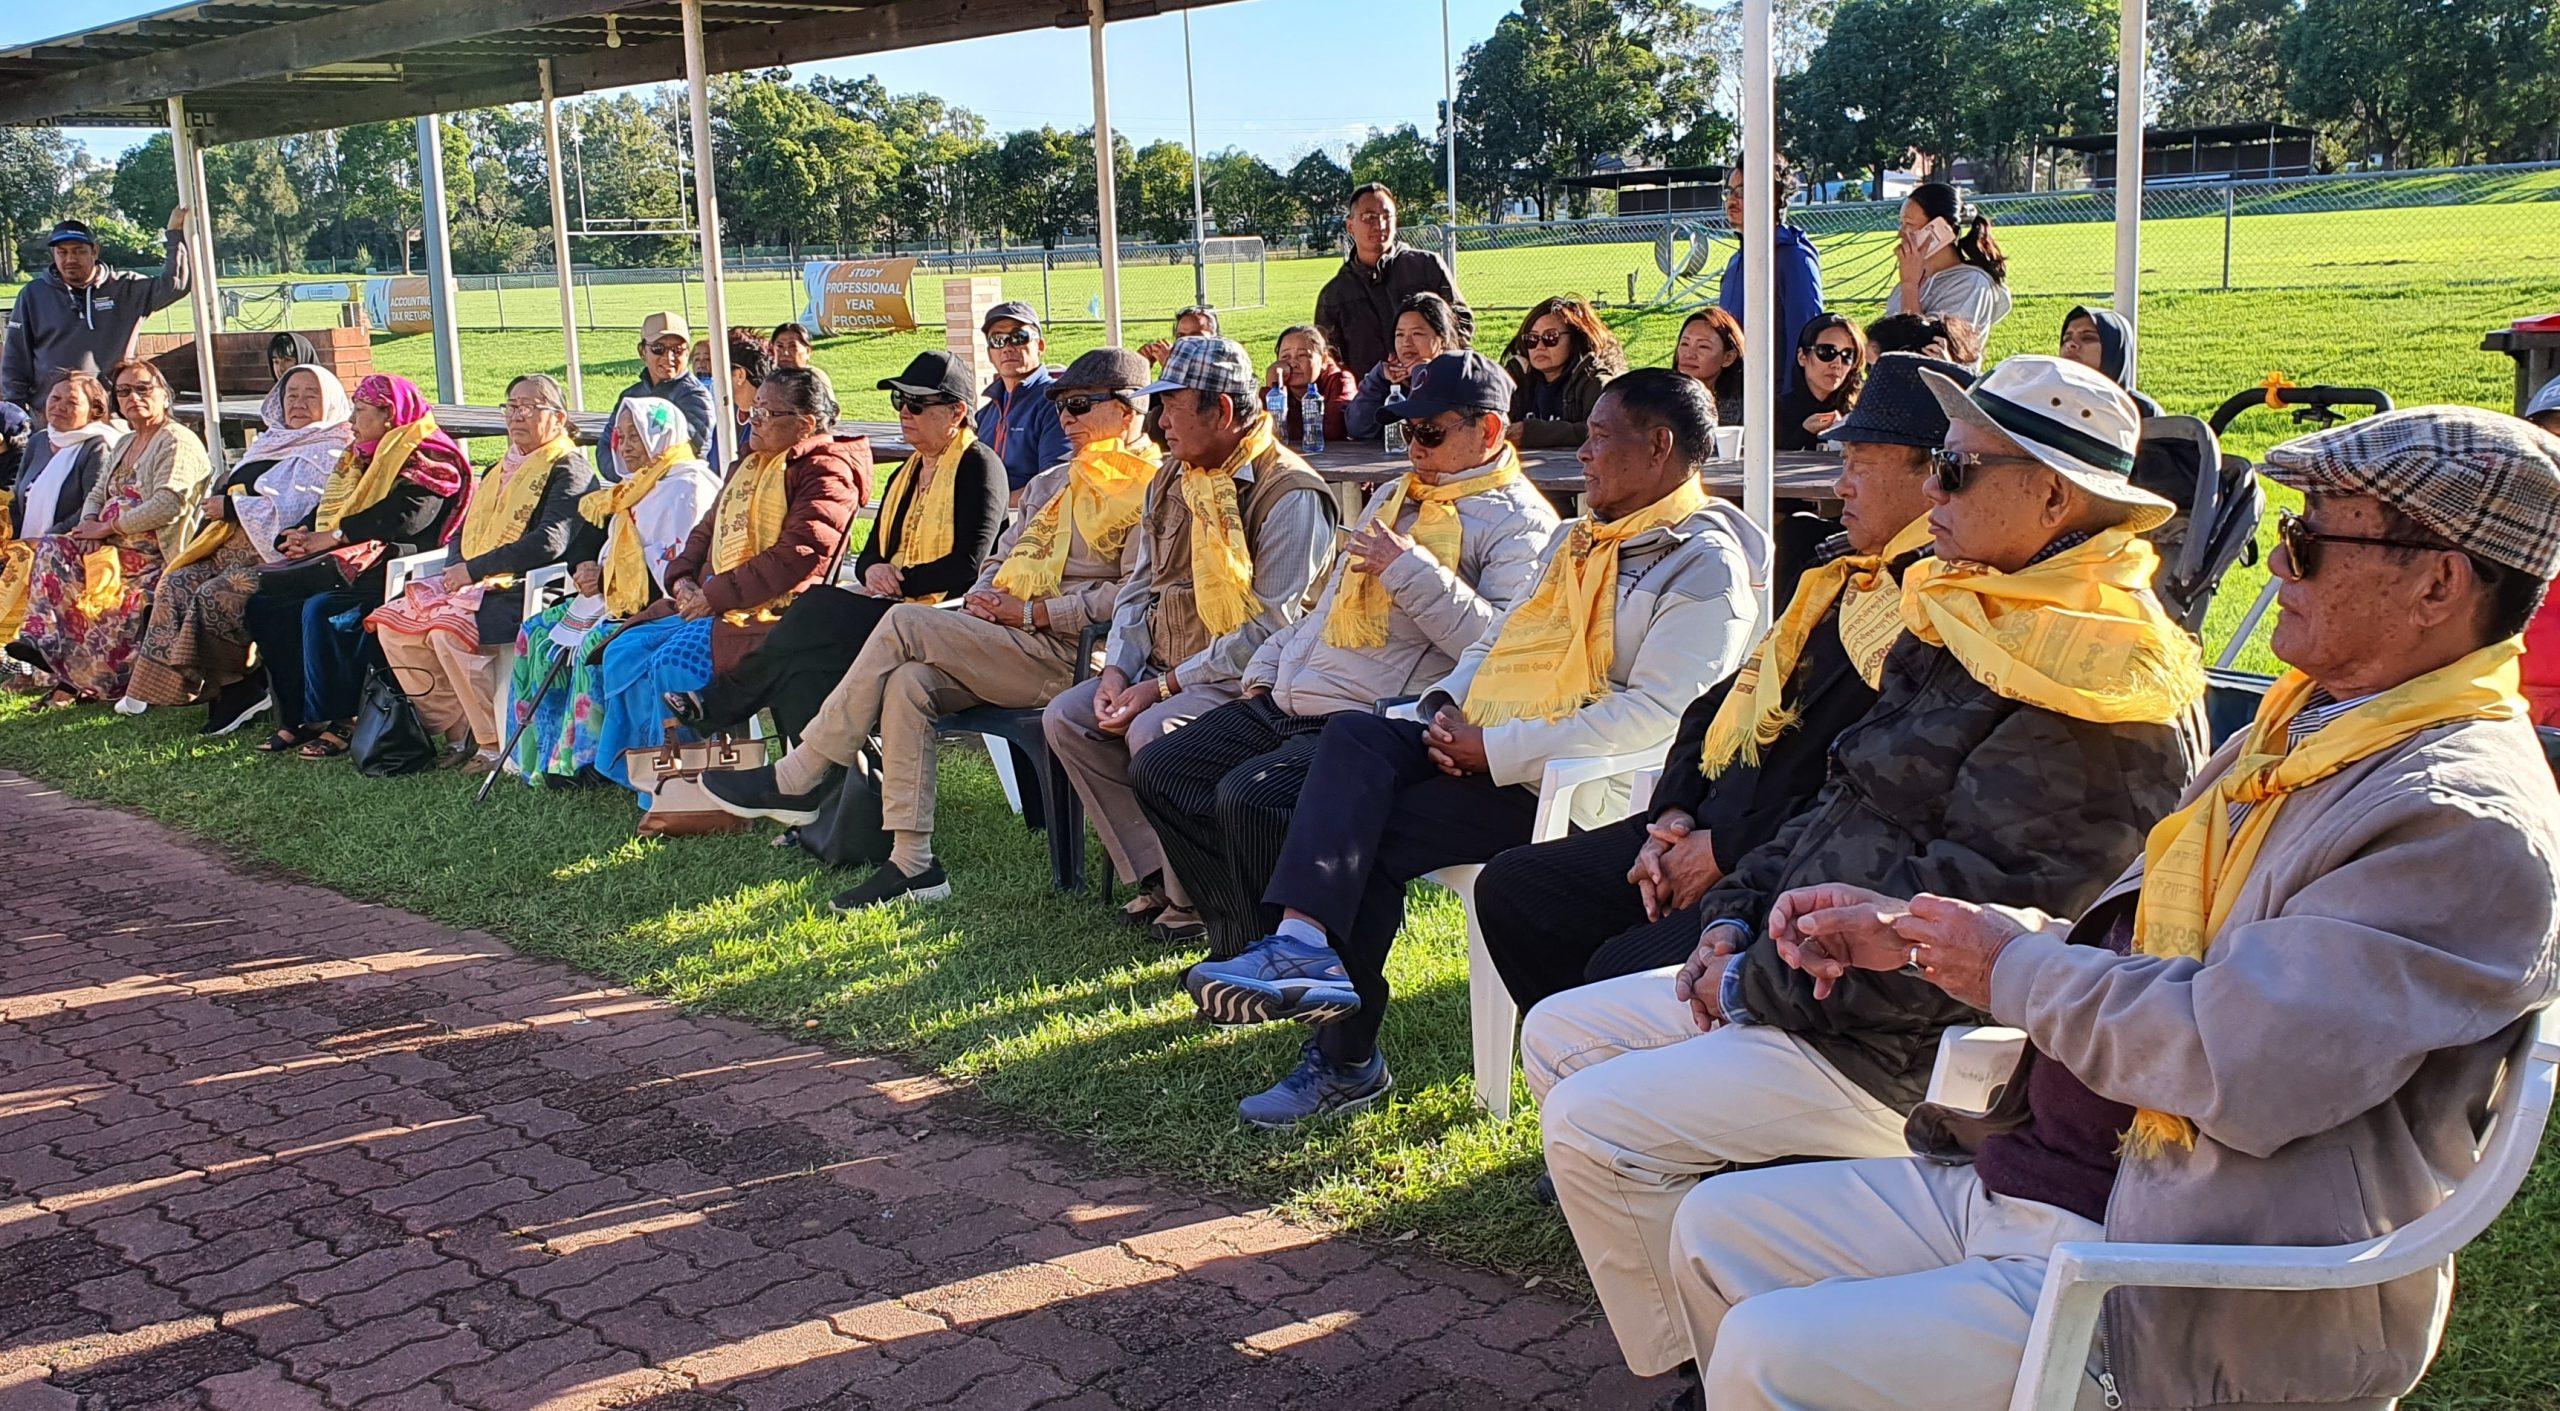 Celebrate Senior's Week 2021 at Park organised by Gurkha Nepalese Community (GNC)